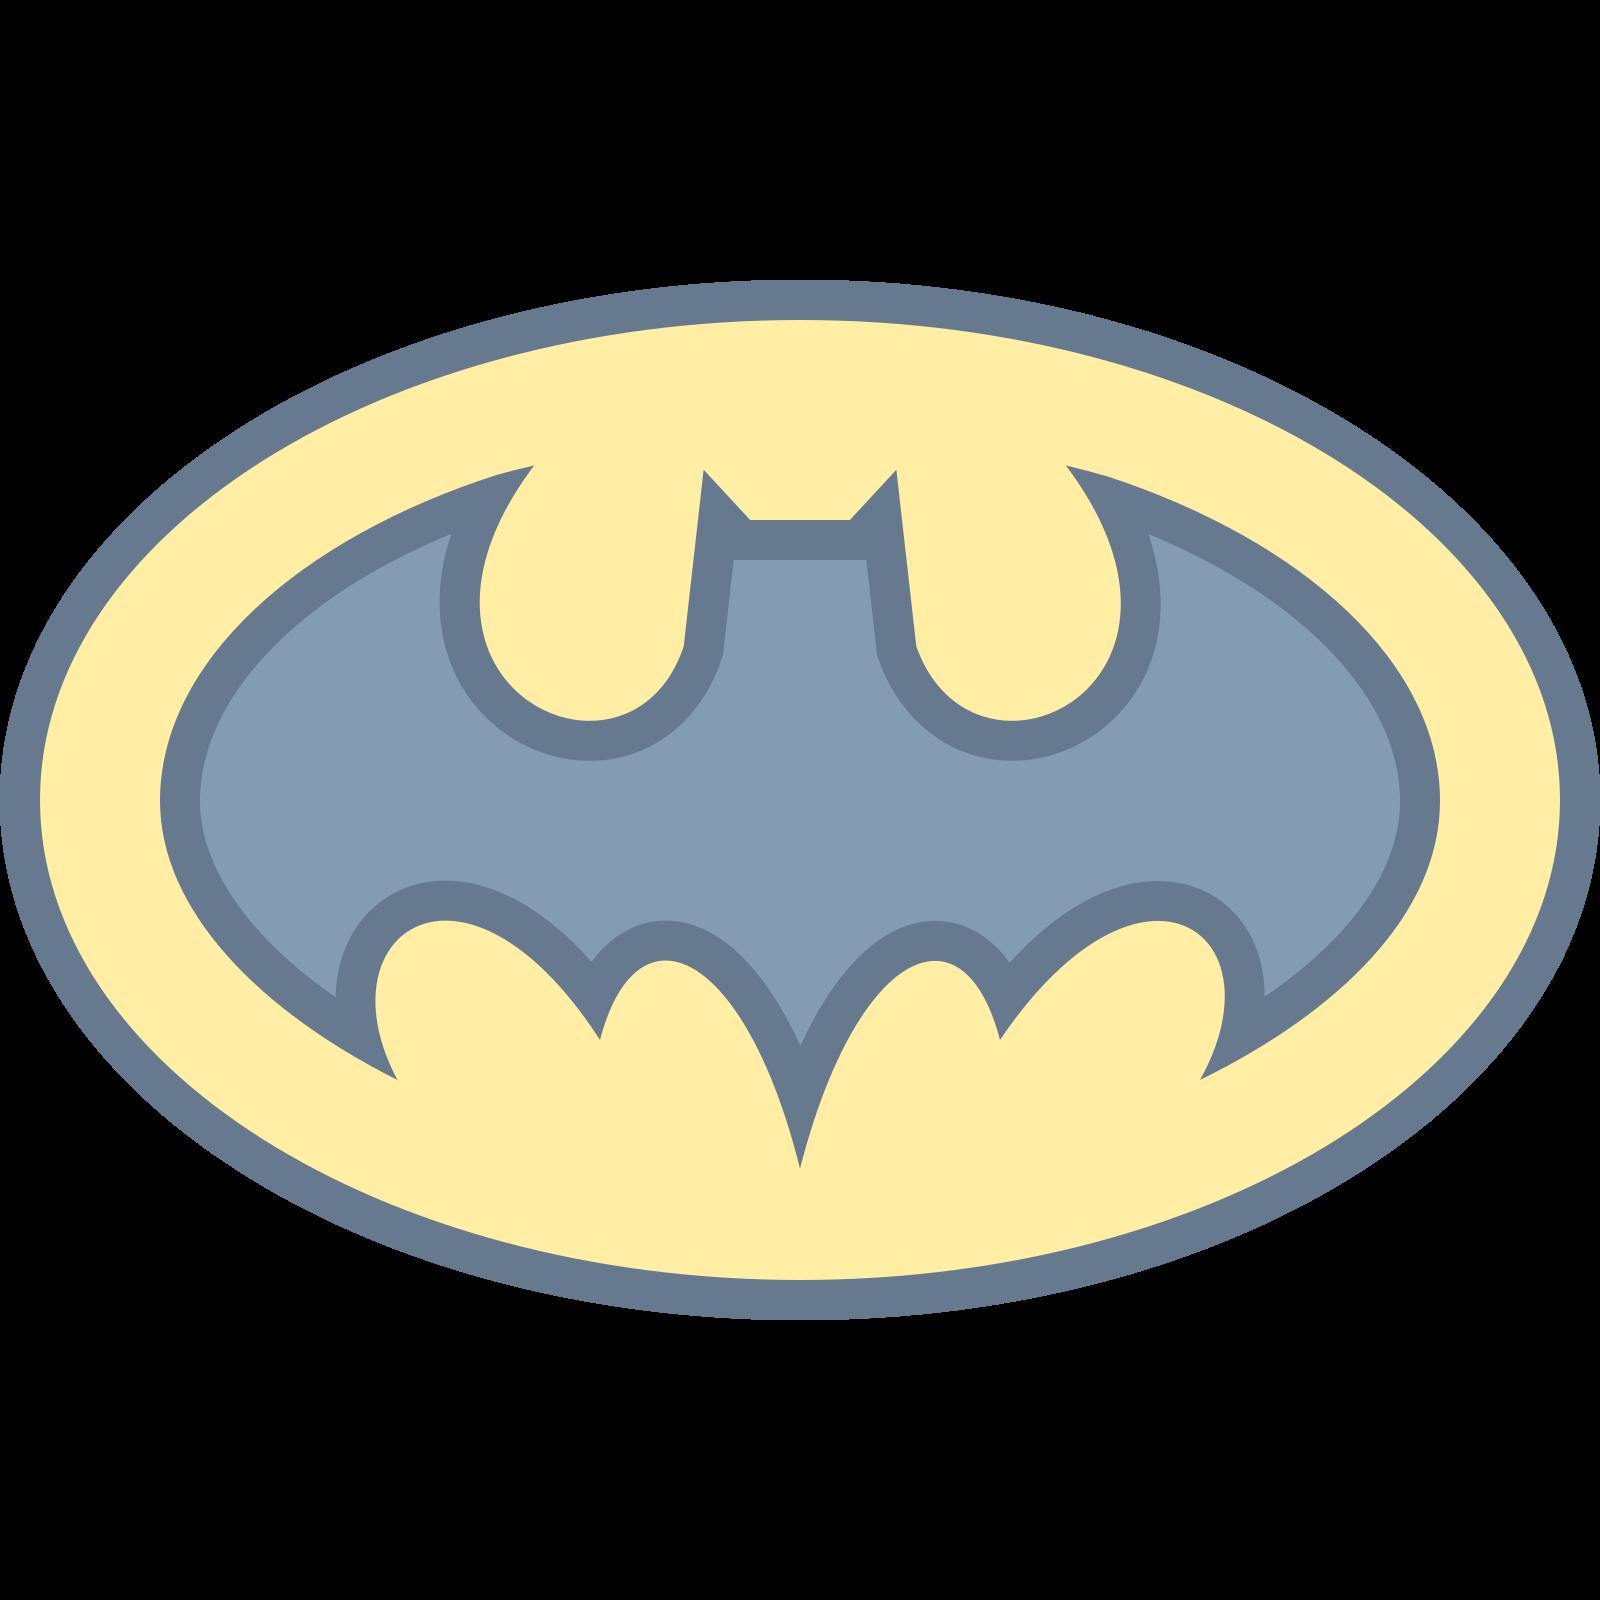 Batman Stary icon